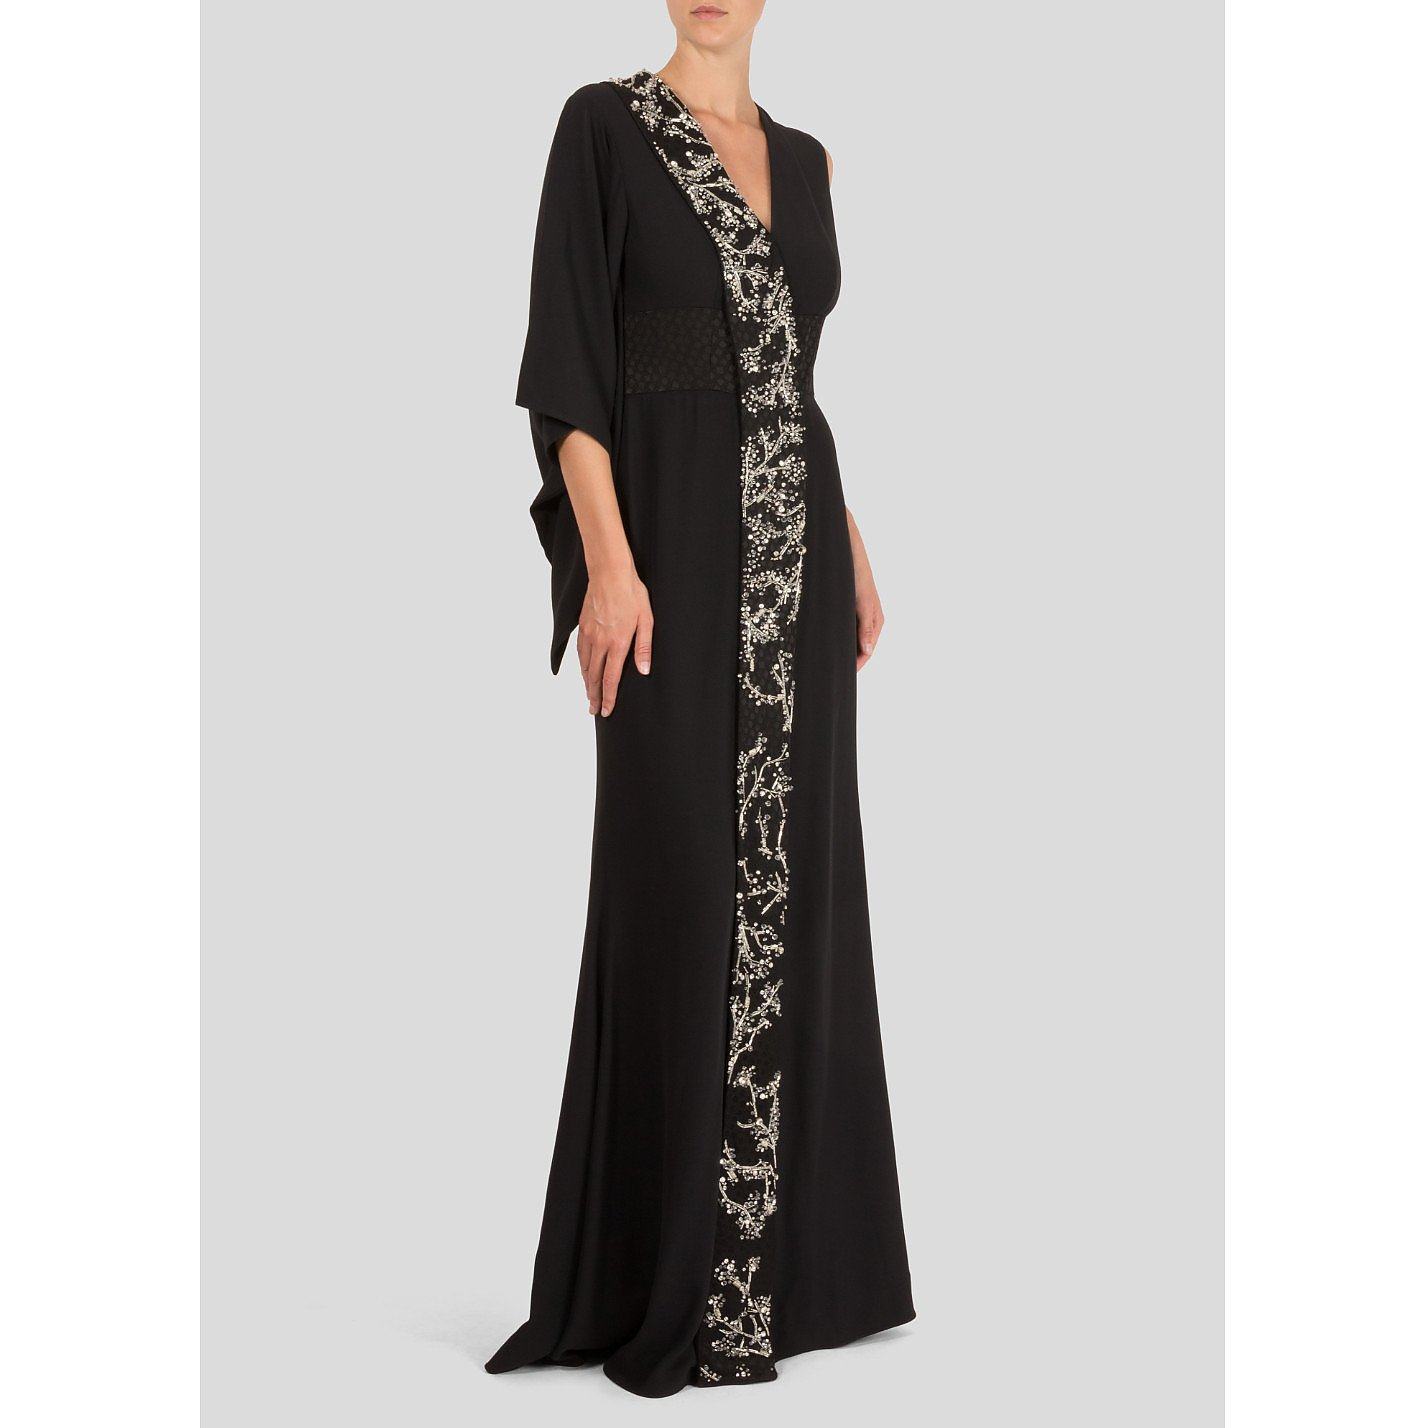 Alexander McQueen Embellished Asymmetrical Gown